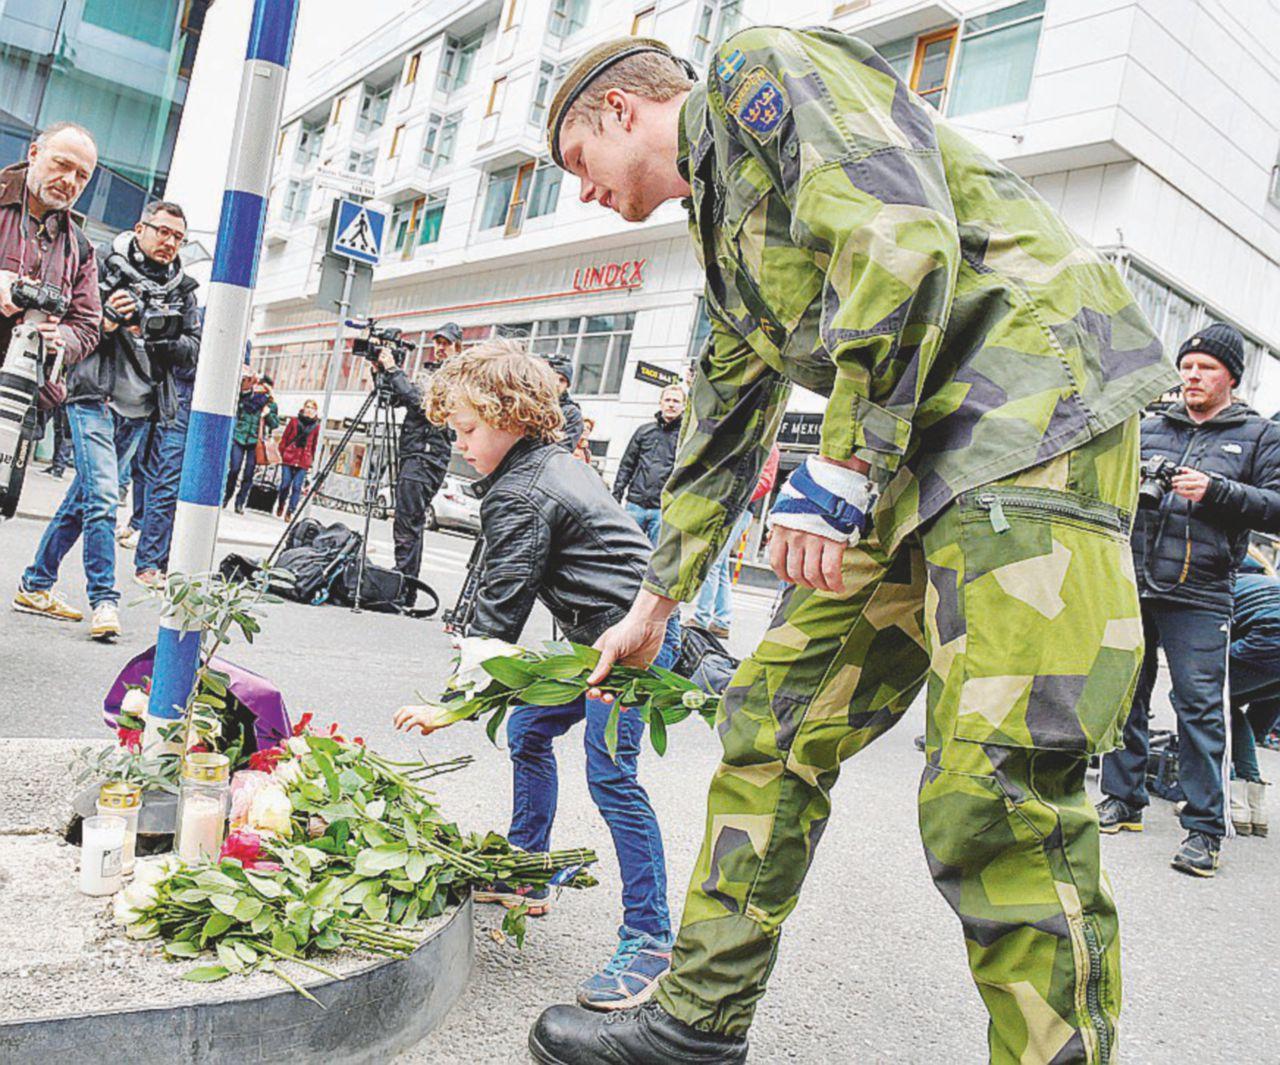 Nella Stoccolma del melting-pot lacrime senza paura